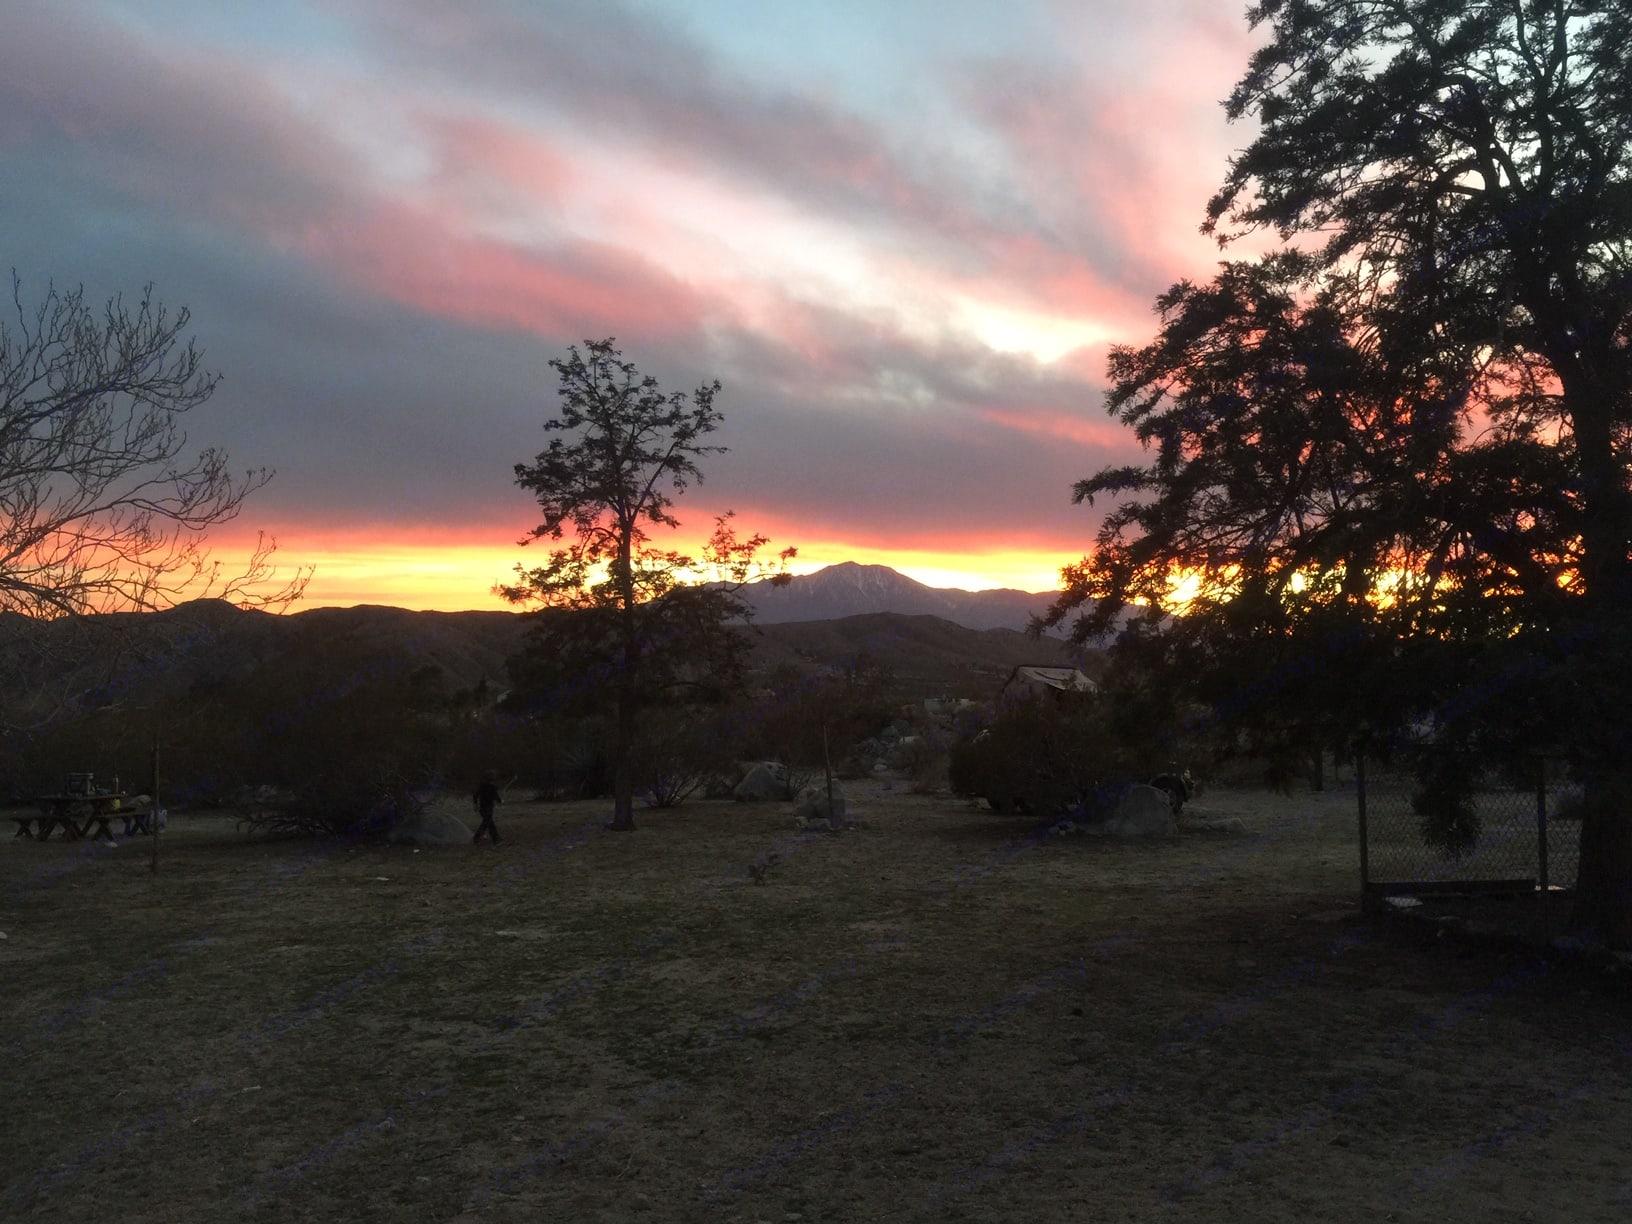 Gorgeous sunset at Joshua Tree!. Ford Explorer 2000